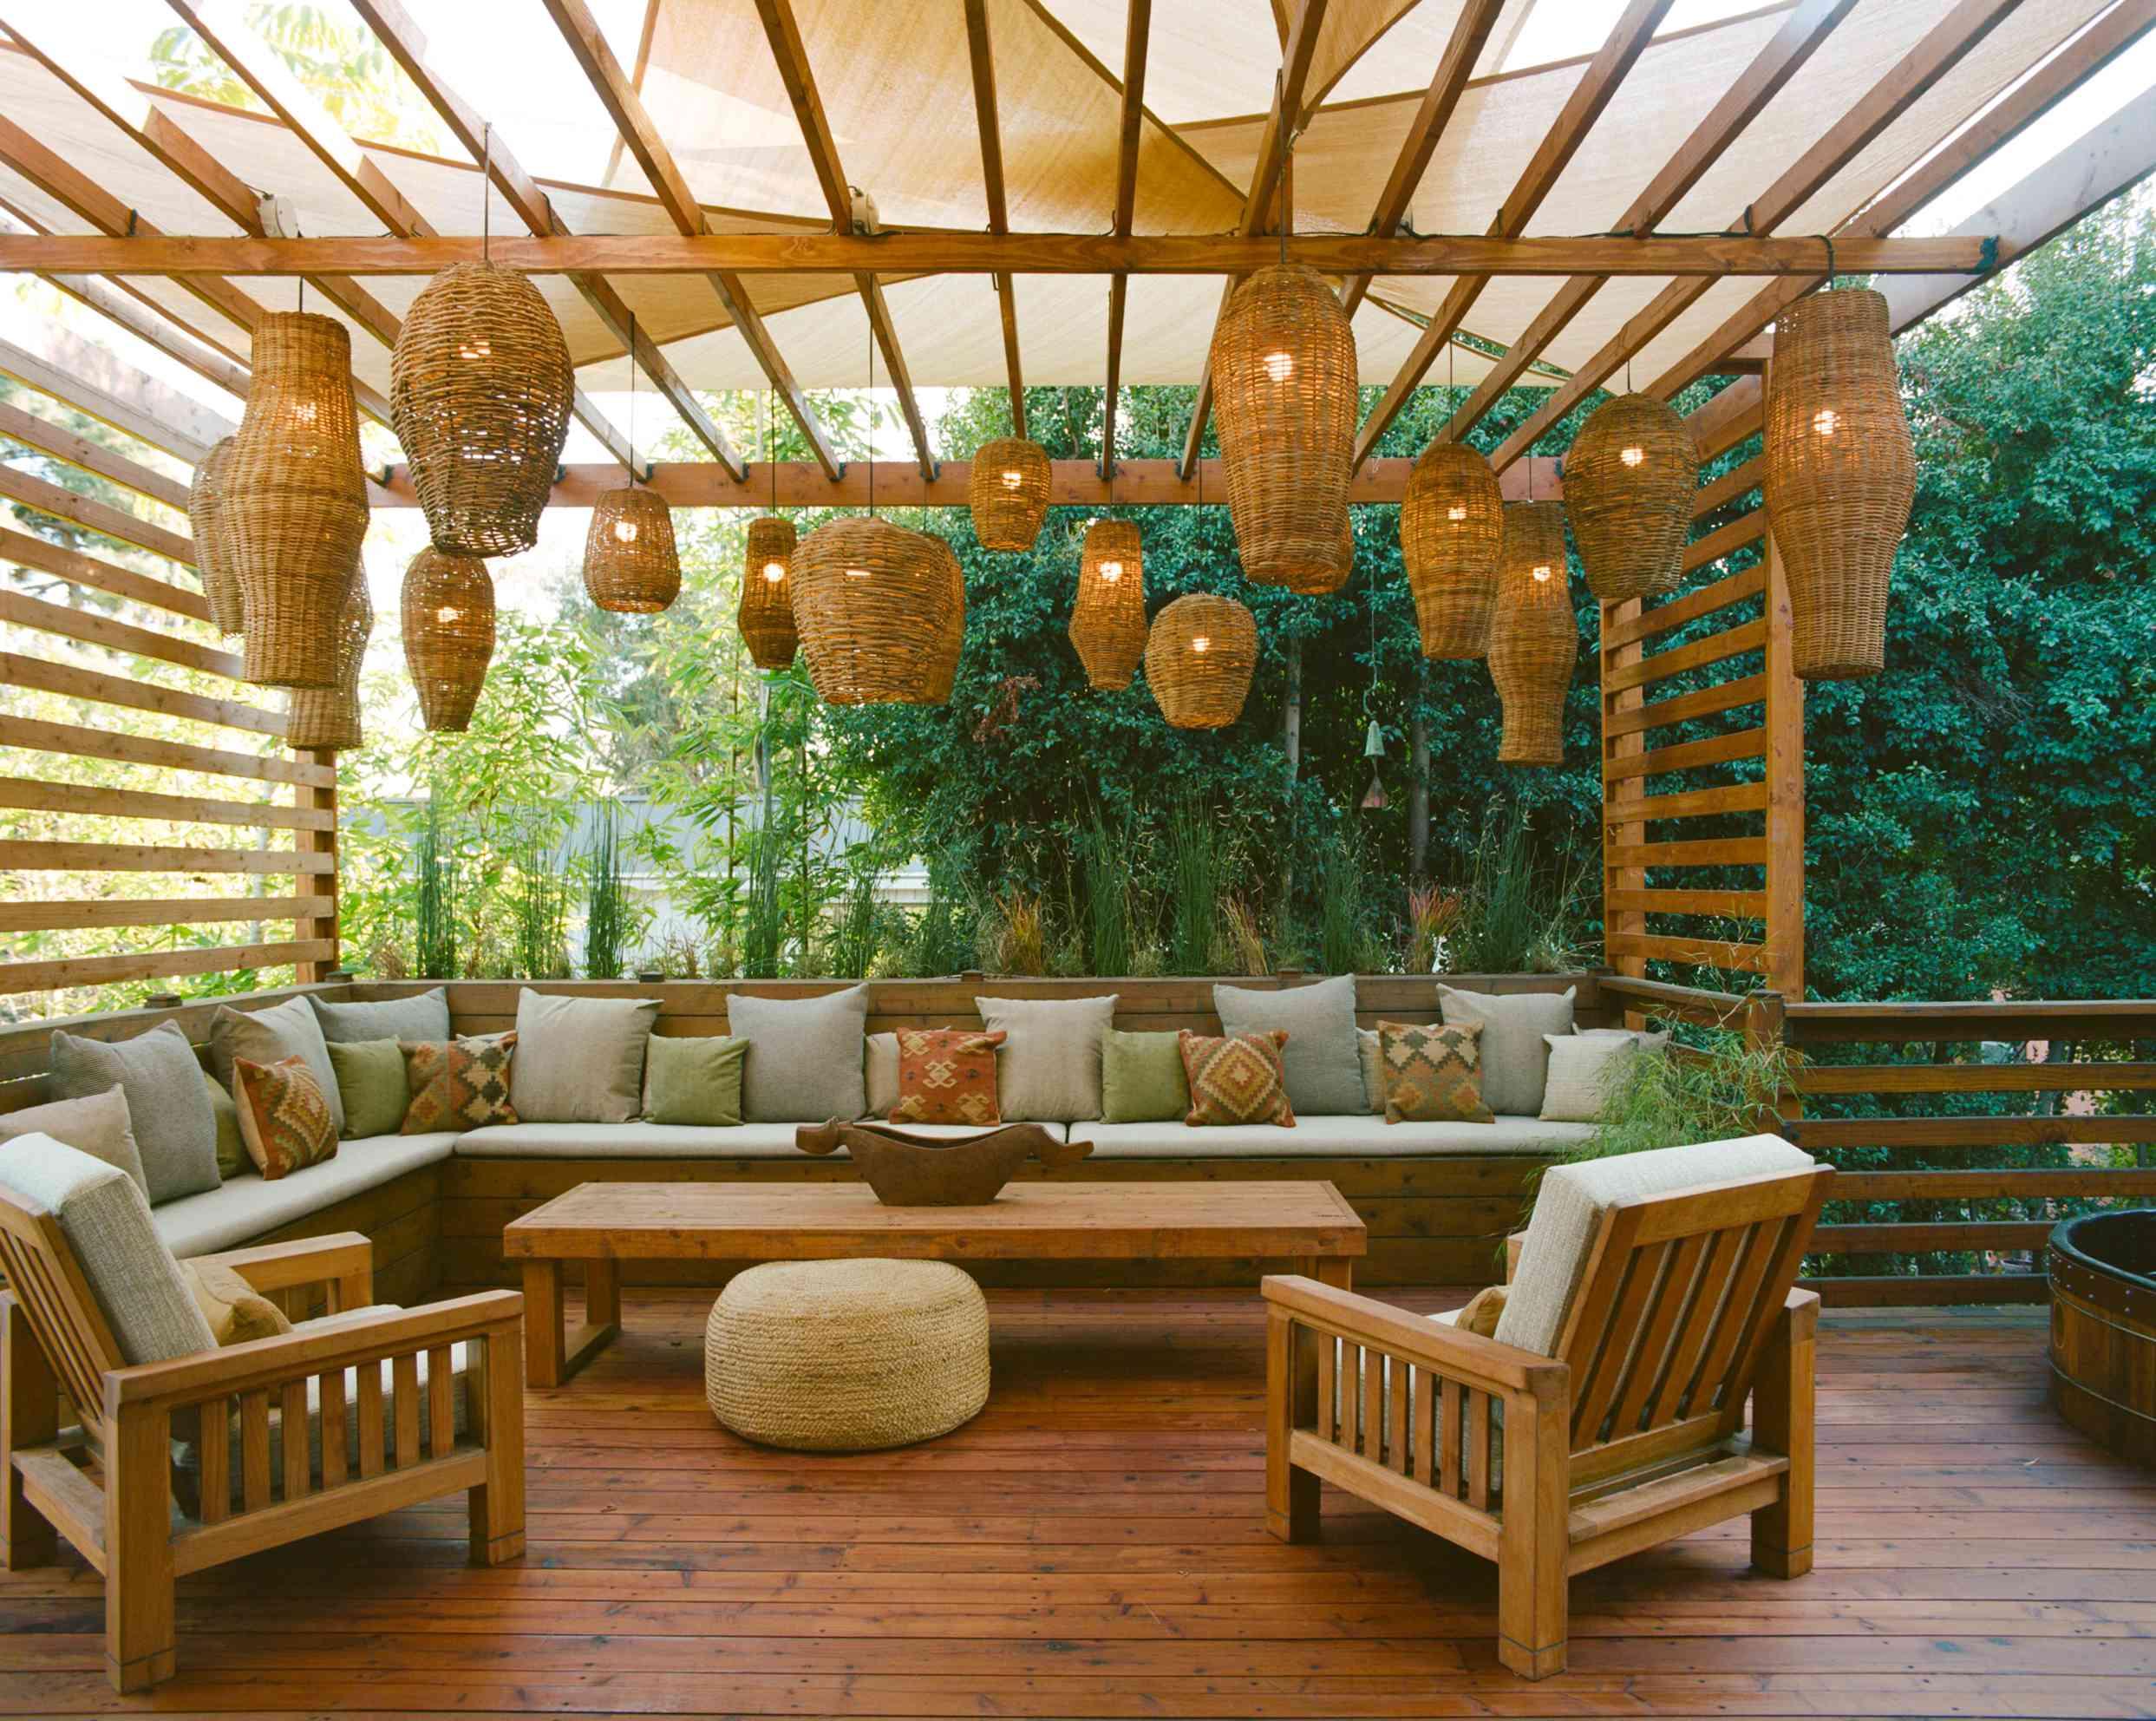 Patio with hanging lanterns